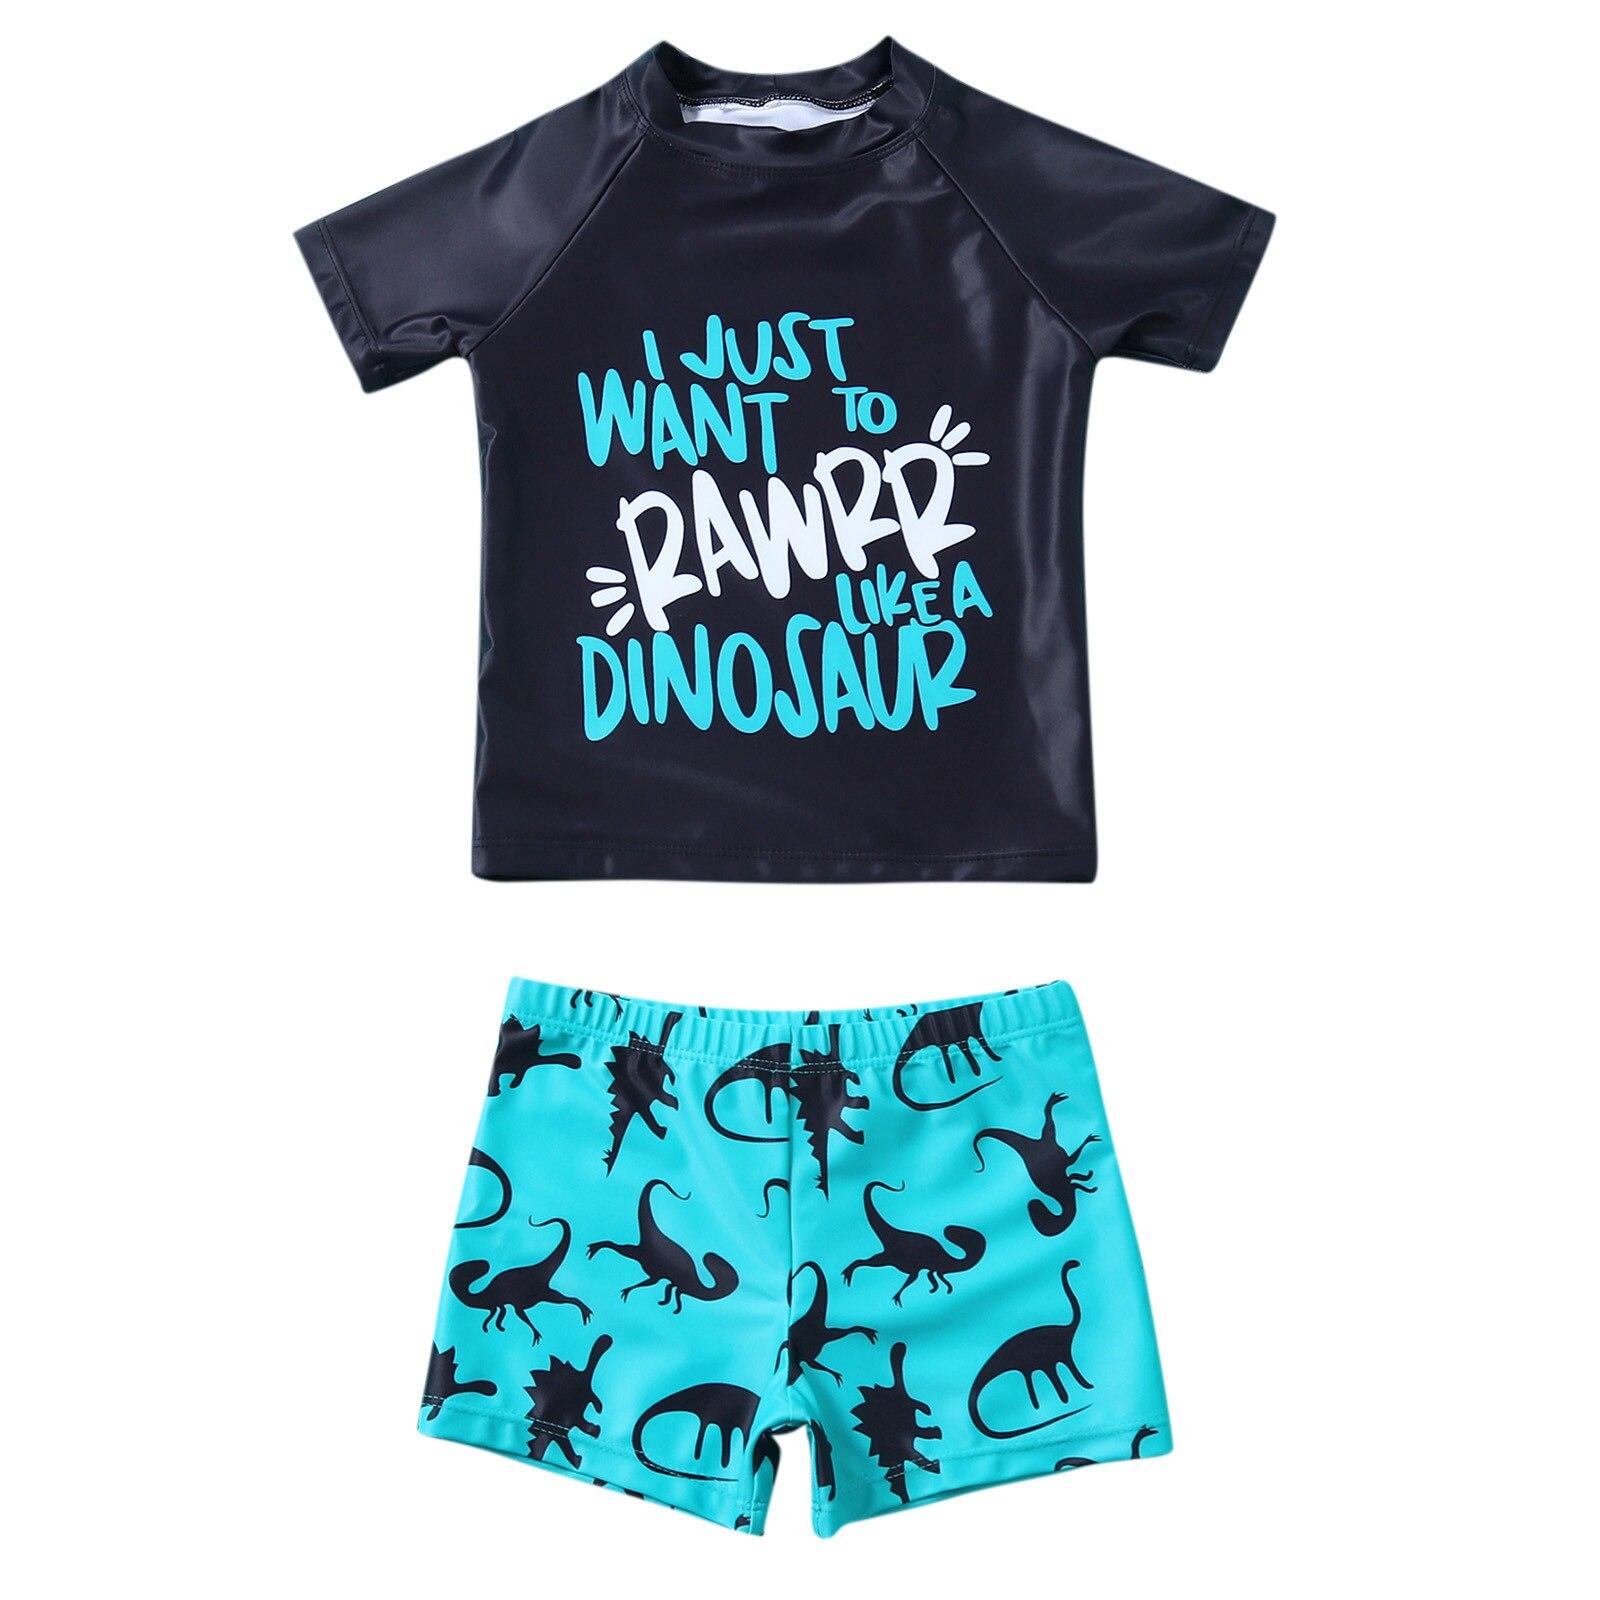 Toddler Kids Baby Boys Swimwear Cartoon Letter Dinosaur Print T Shirt Shorts Set Summer Swimsuit Swimming Beachwear Outfits